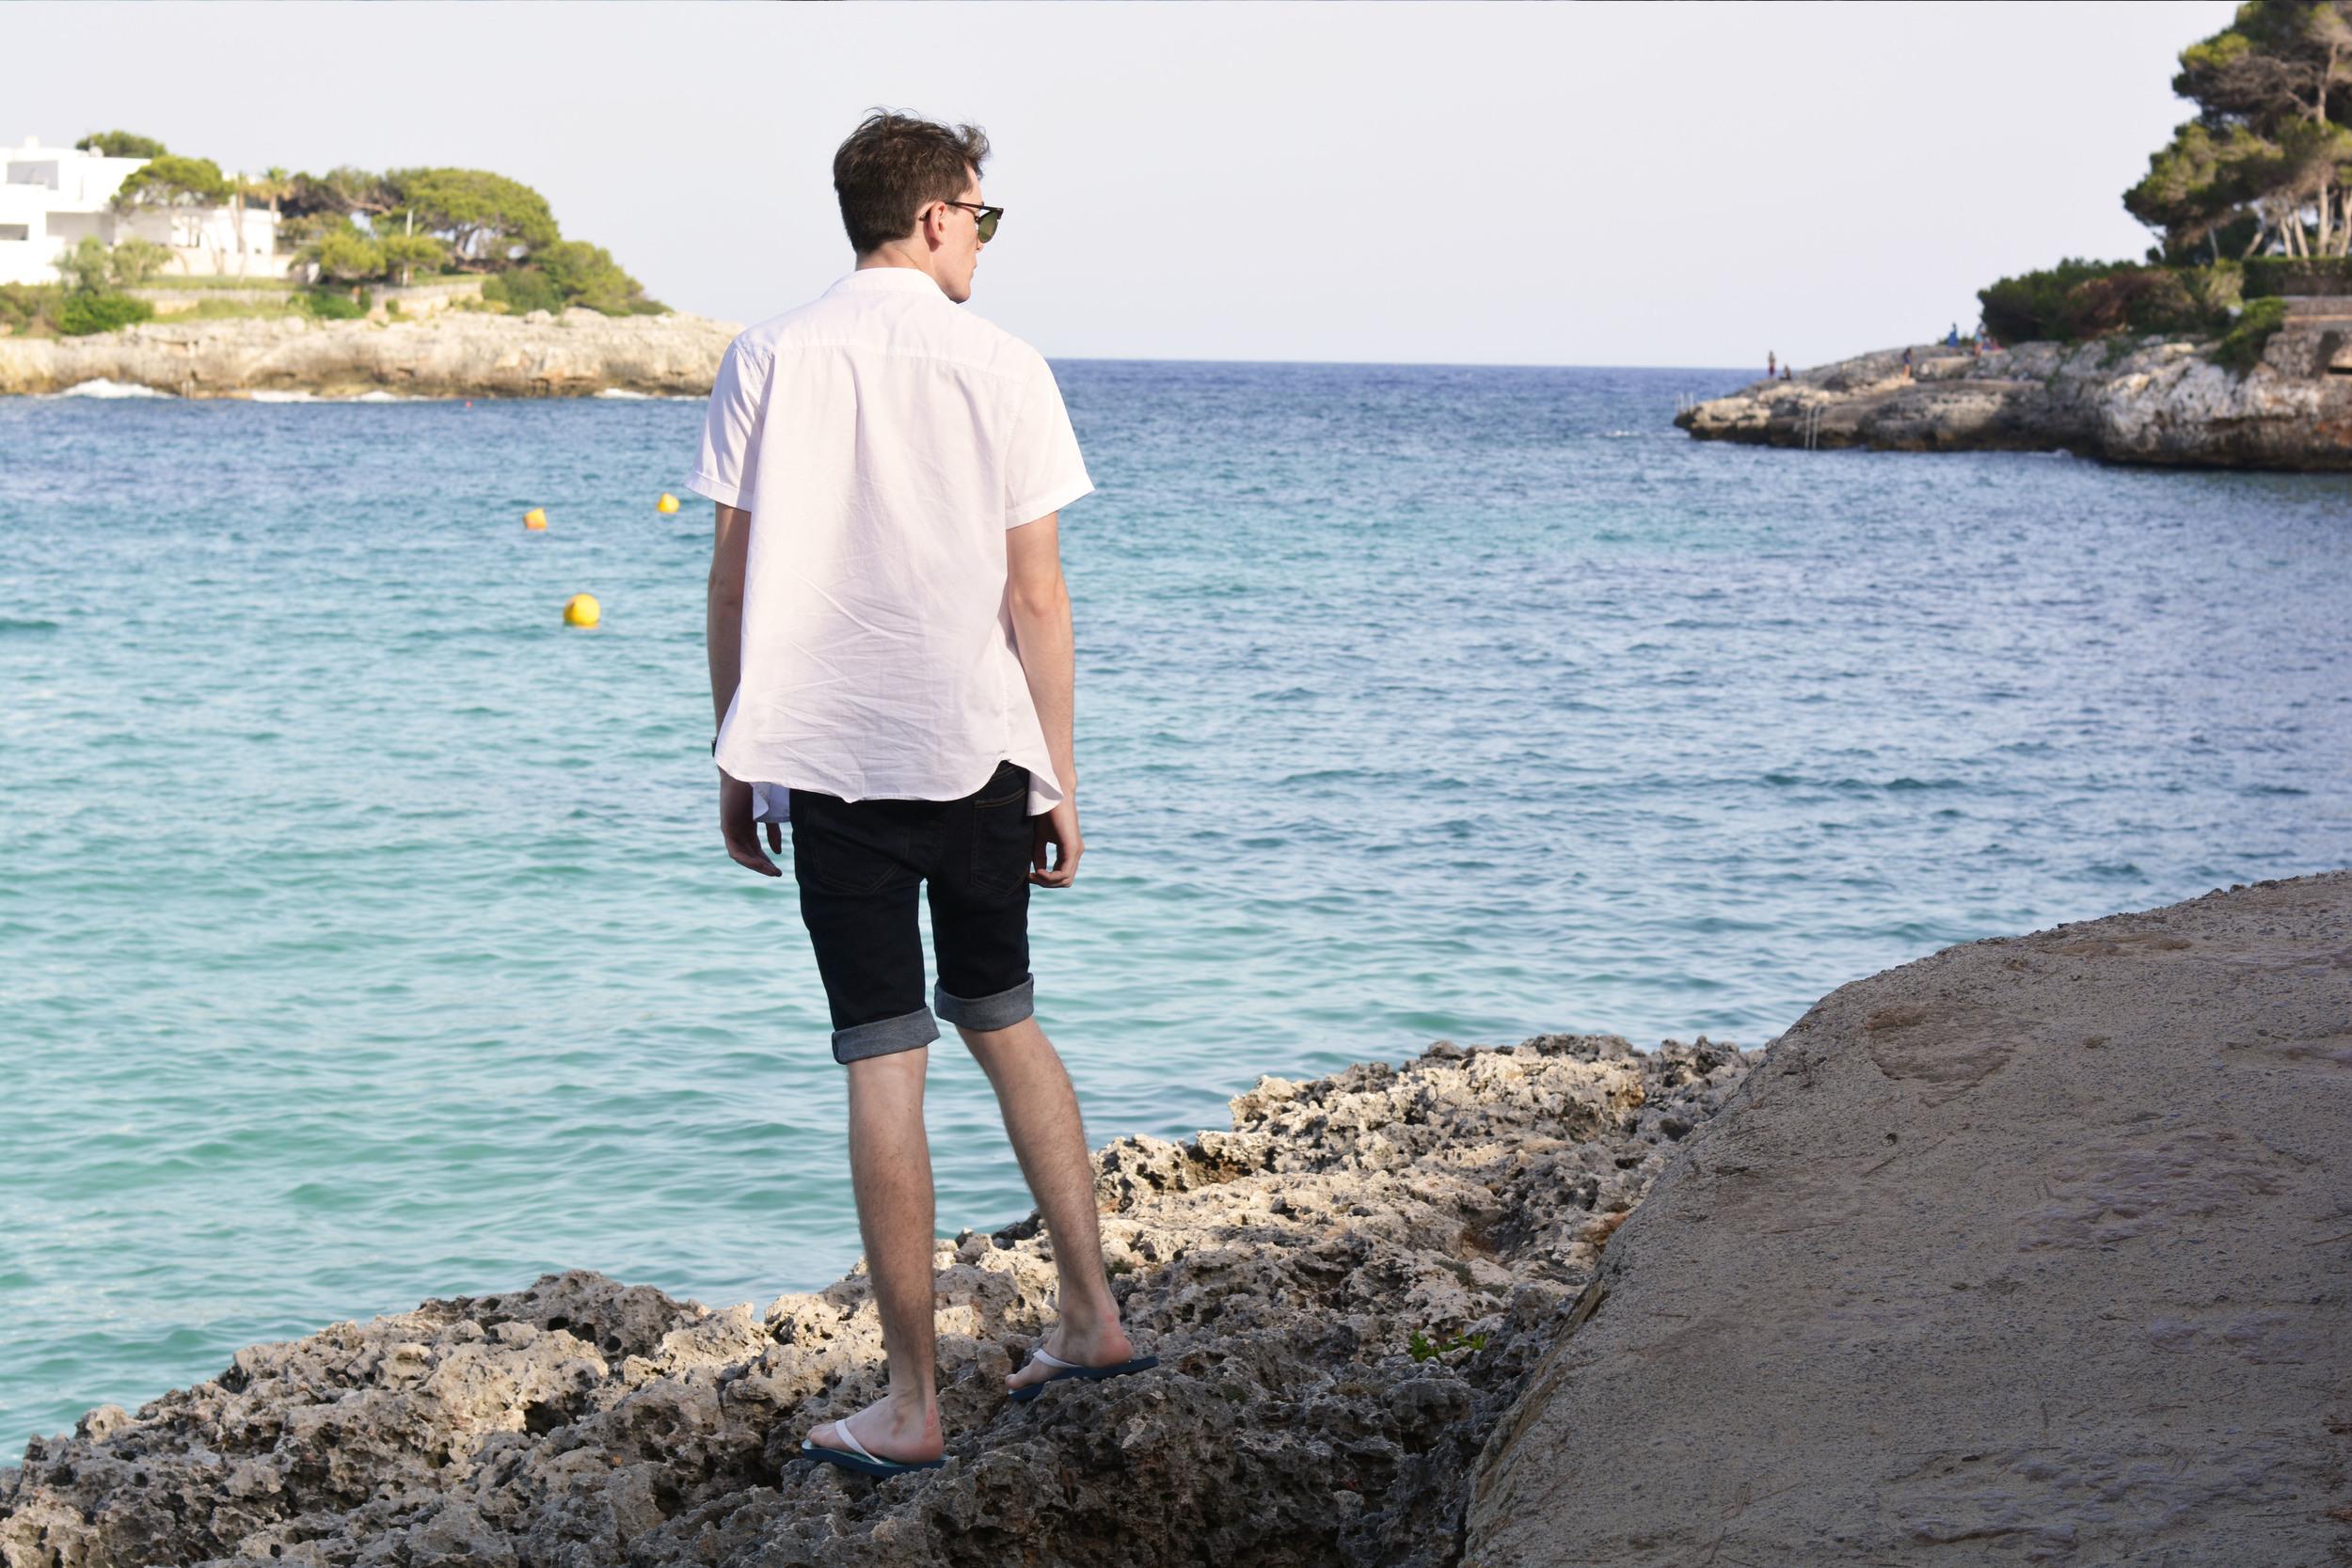 Blue Inc Menswear | Sam Squire UK Male Fashion & Lifestyle Blogger